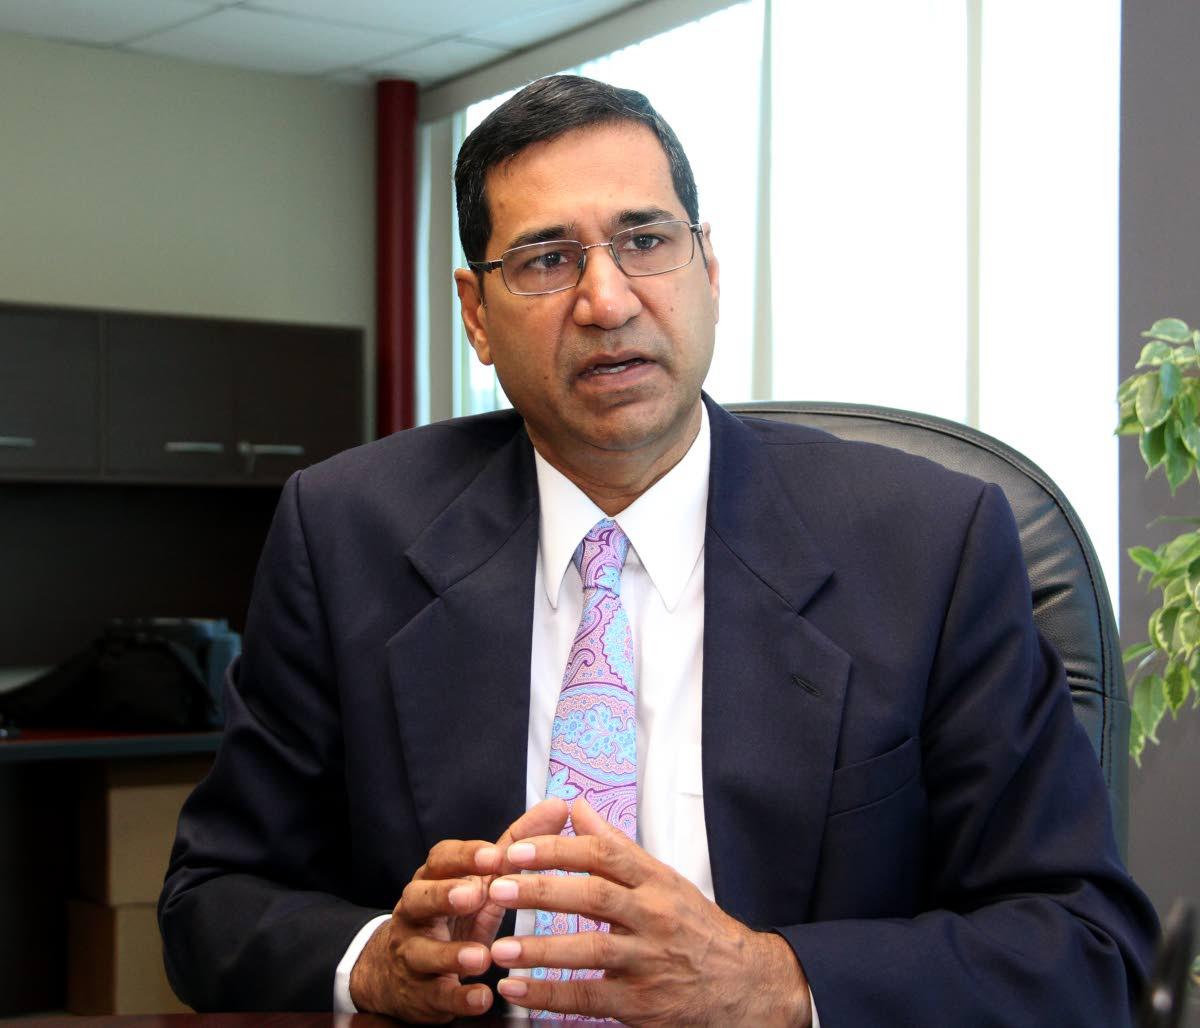 Justice Peter Jamadar